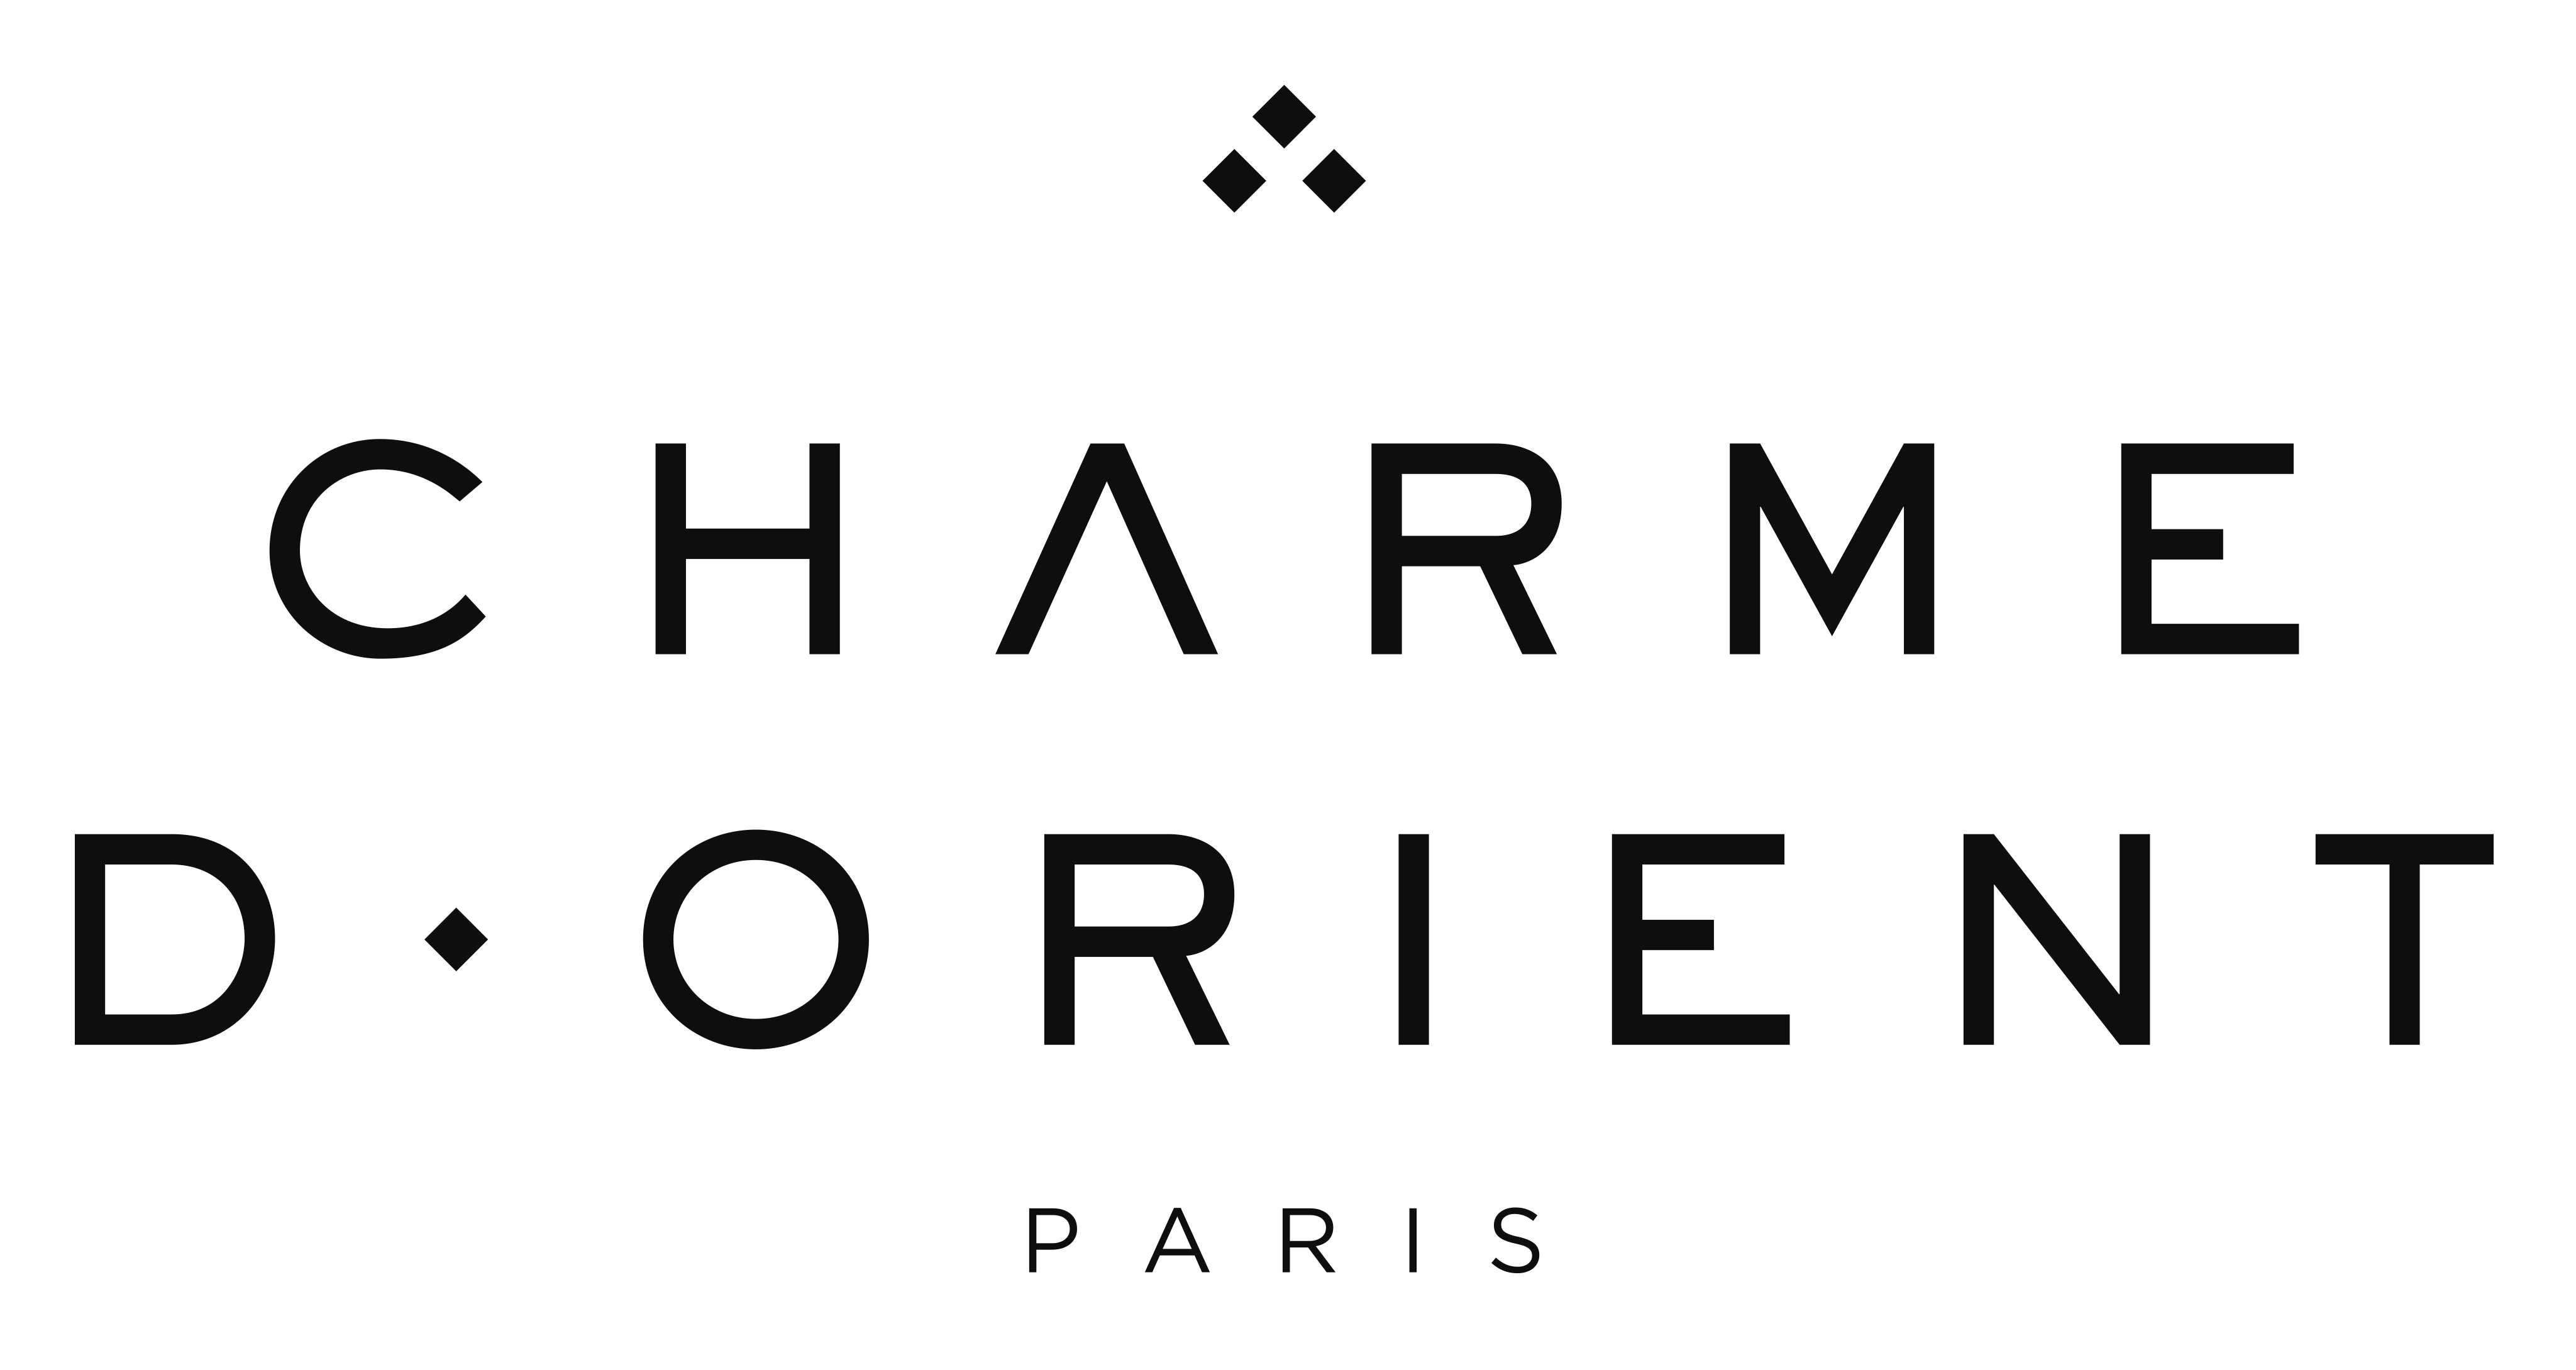 charme_d_orient_sarlat_logo